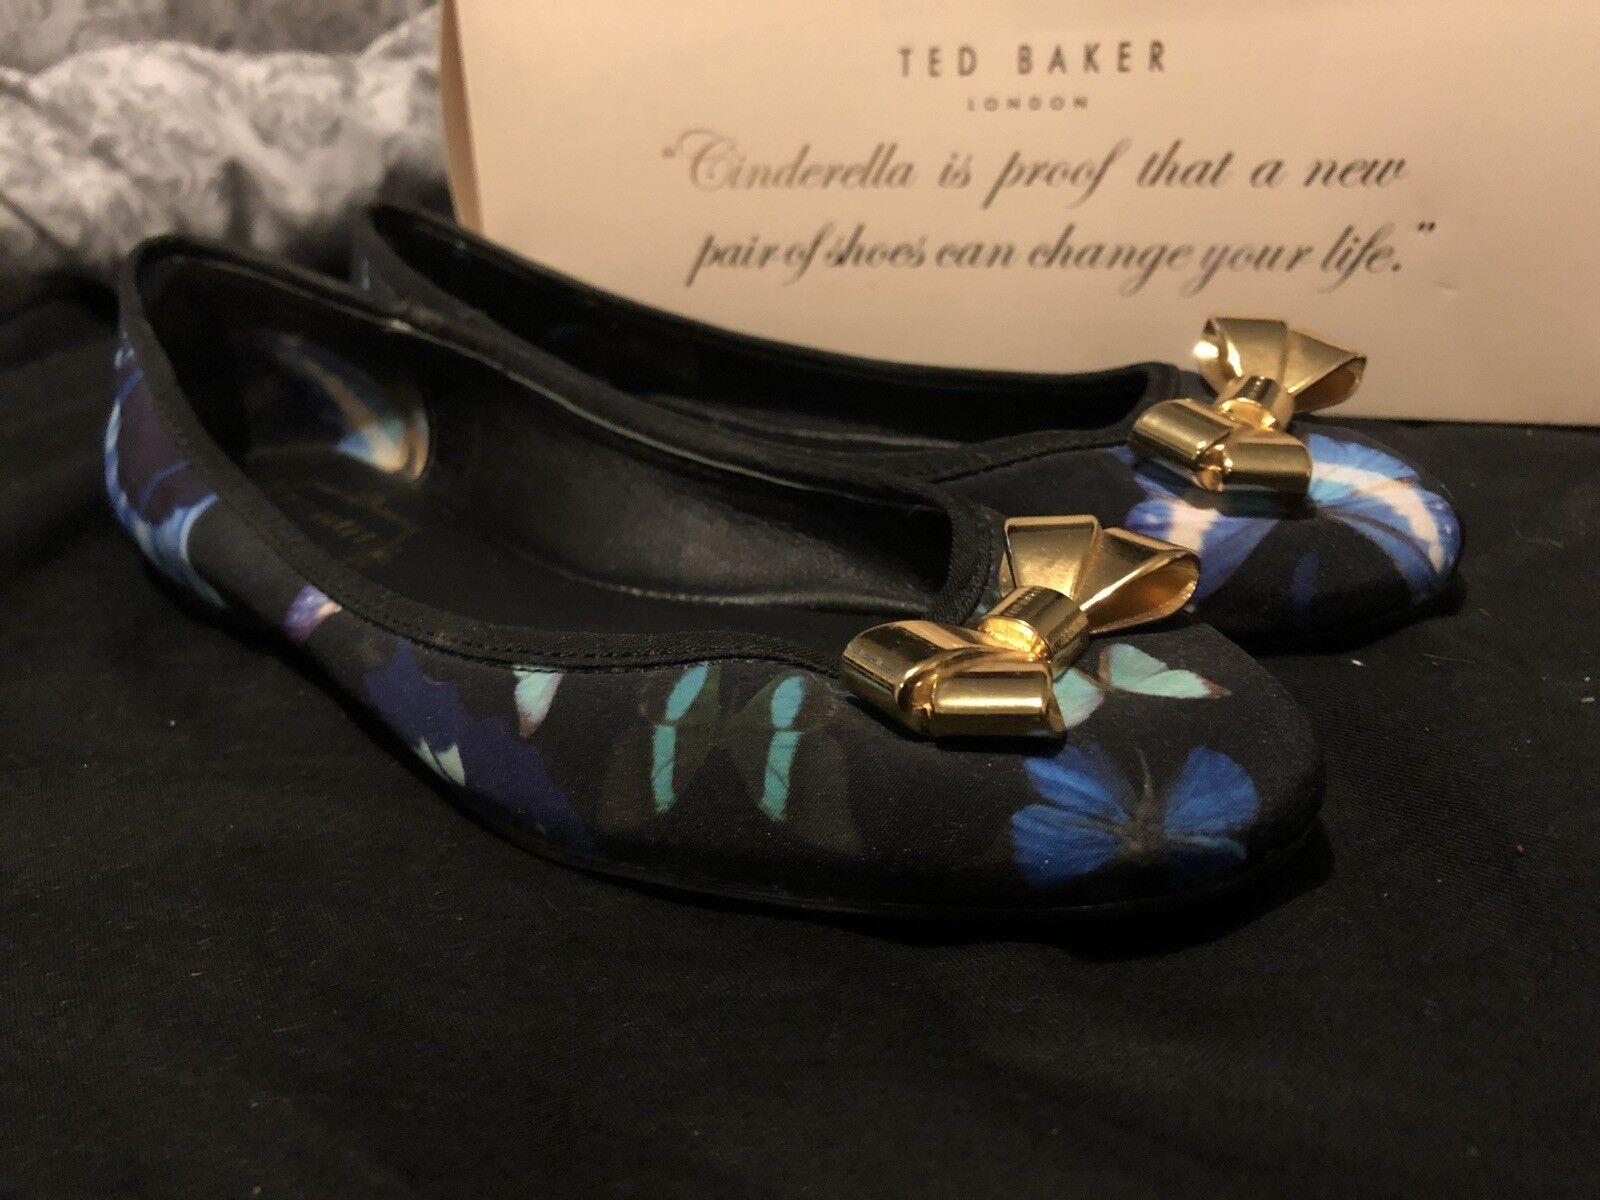 Femmes Taille 3 Ted Baker Bleu et Noir Papillon Dolly Chaussures